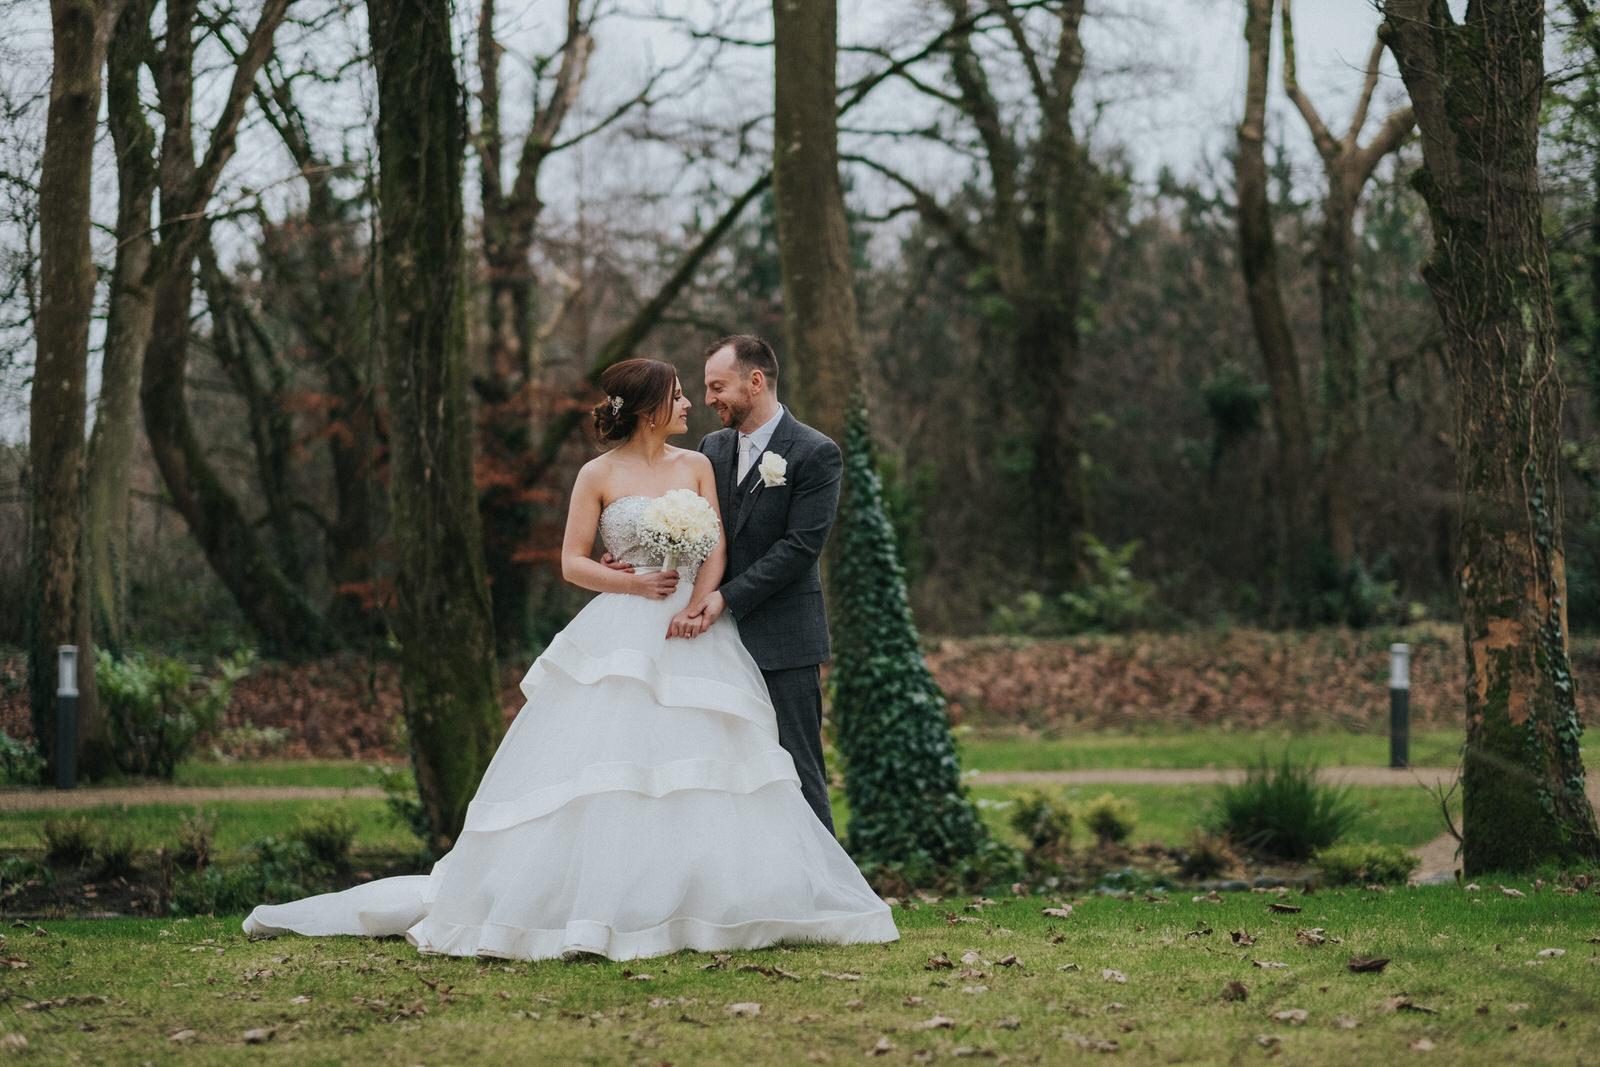 Clonabreany_wedding-photographer_roger_kenny_ireland_080.jpg